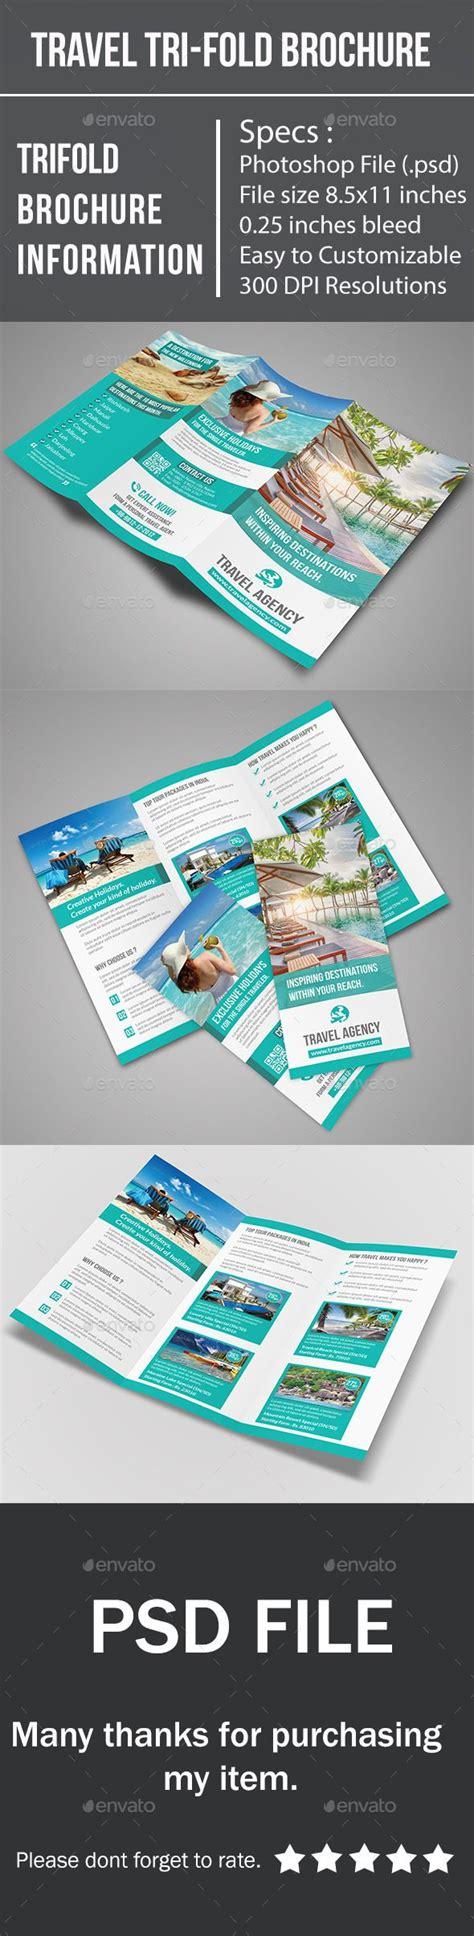 photoshop tutorial trifold travel brochure design youtube